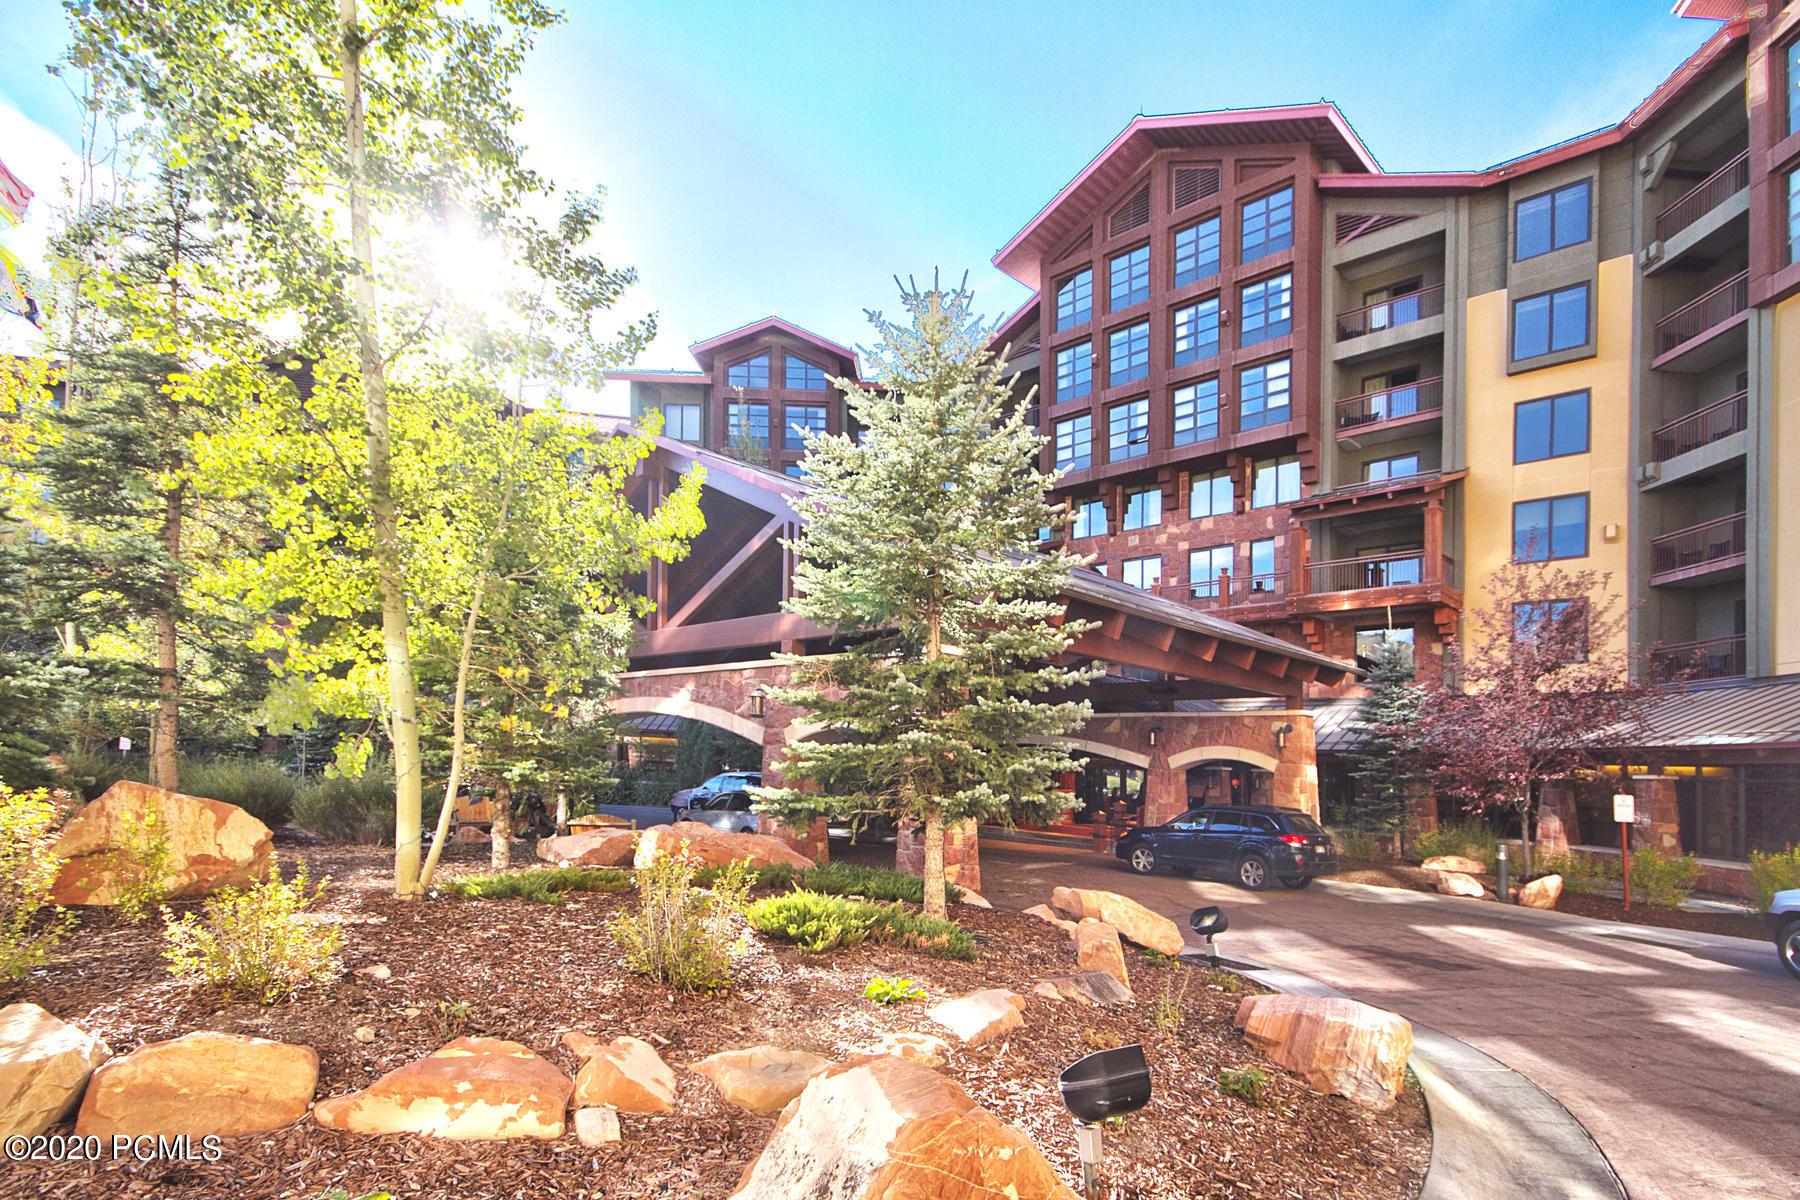 3855 Grand Summit Drive, Park City, Utah 84098, ,1 BathroomBathrooms,Fractional Interest,For Sale,Grand Summit,12005014